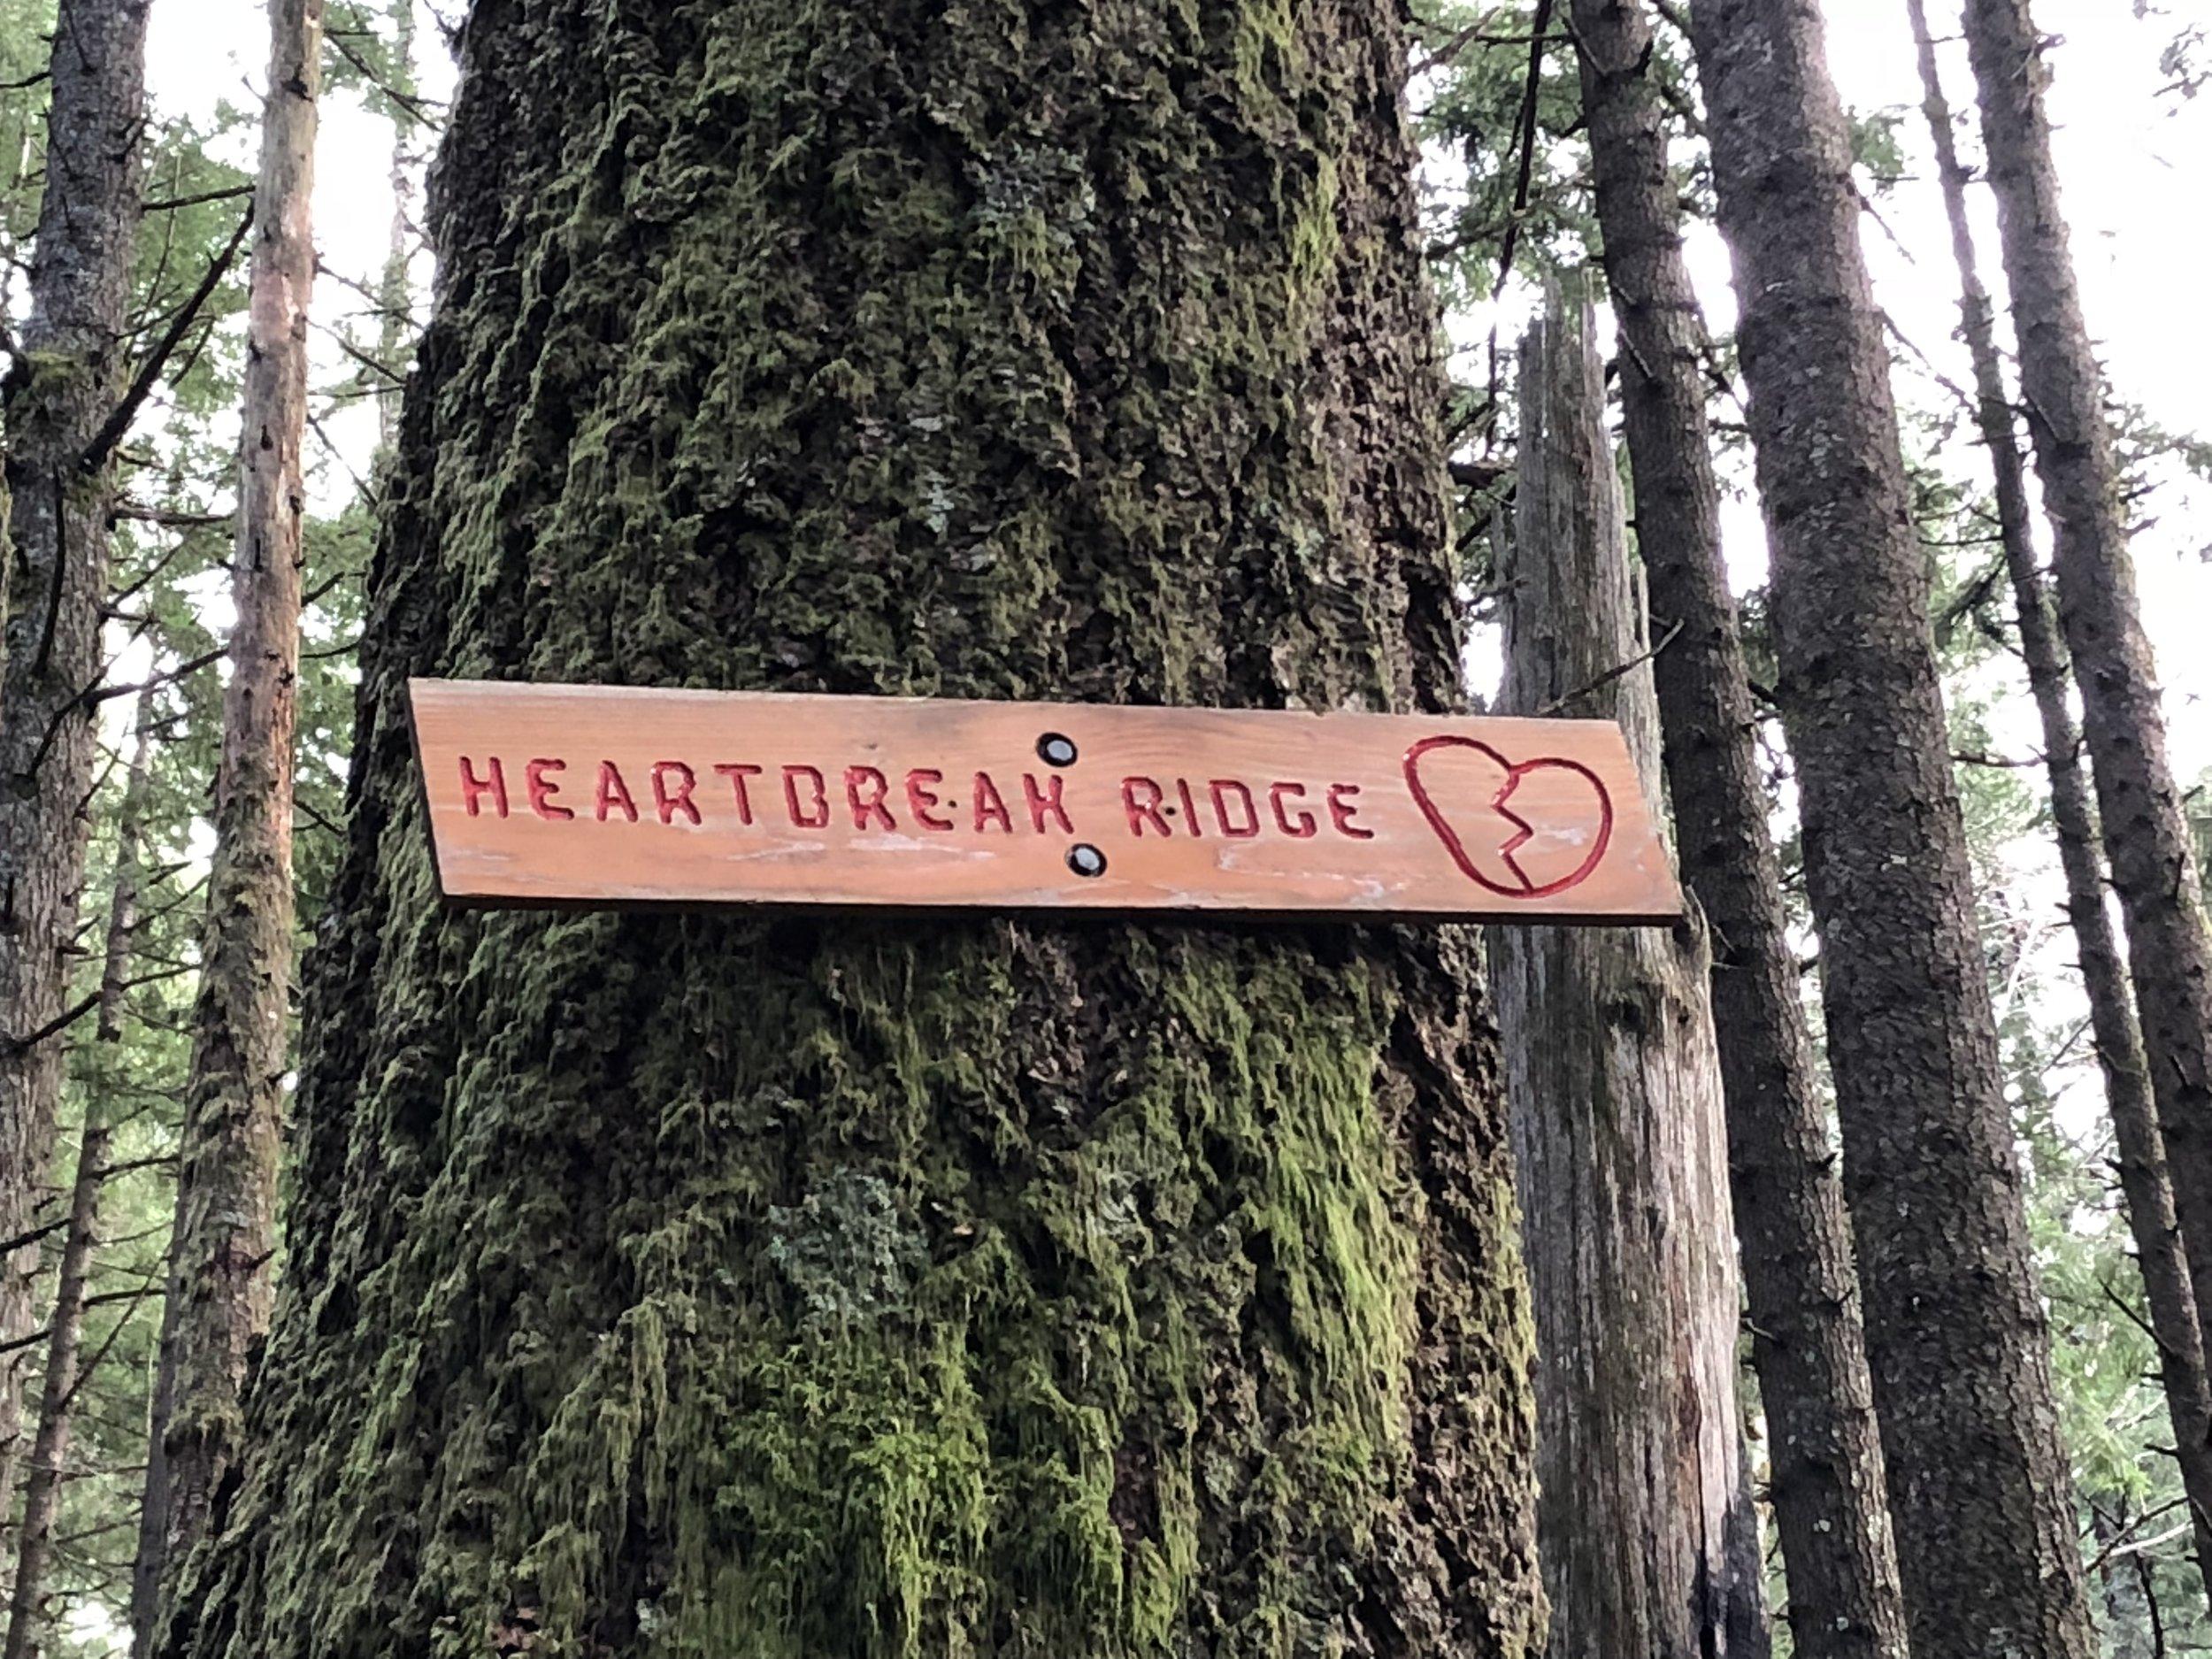 Sign marking the Heartbreak Ridge Trail.